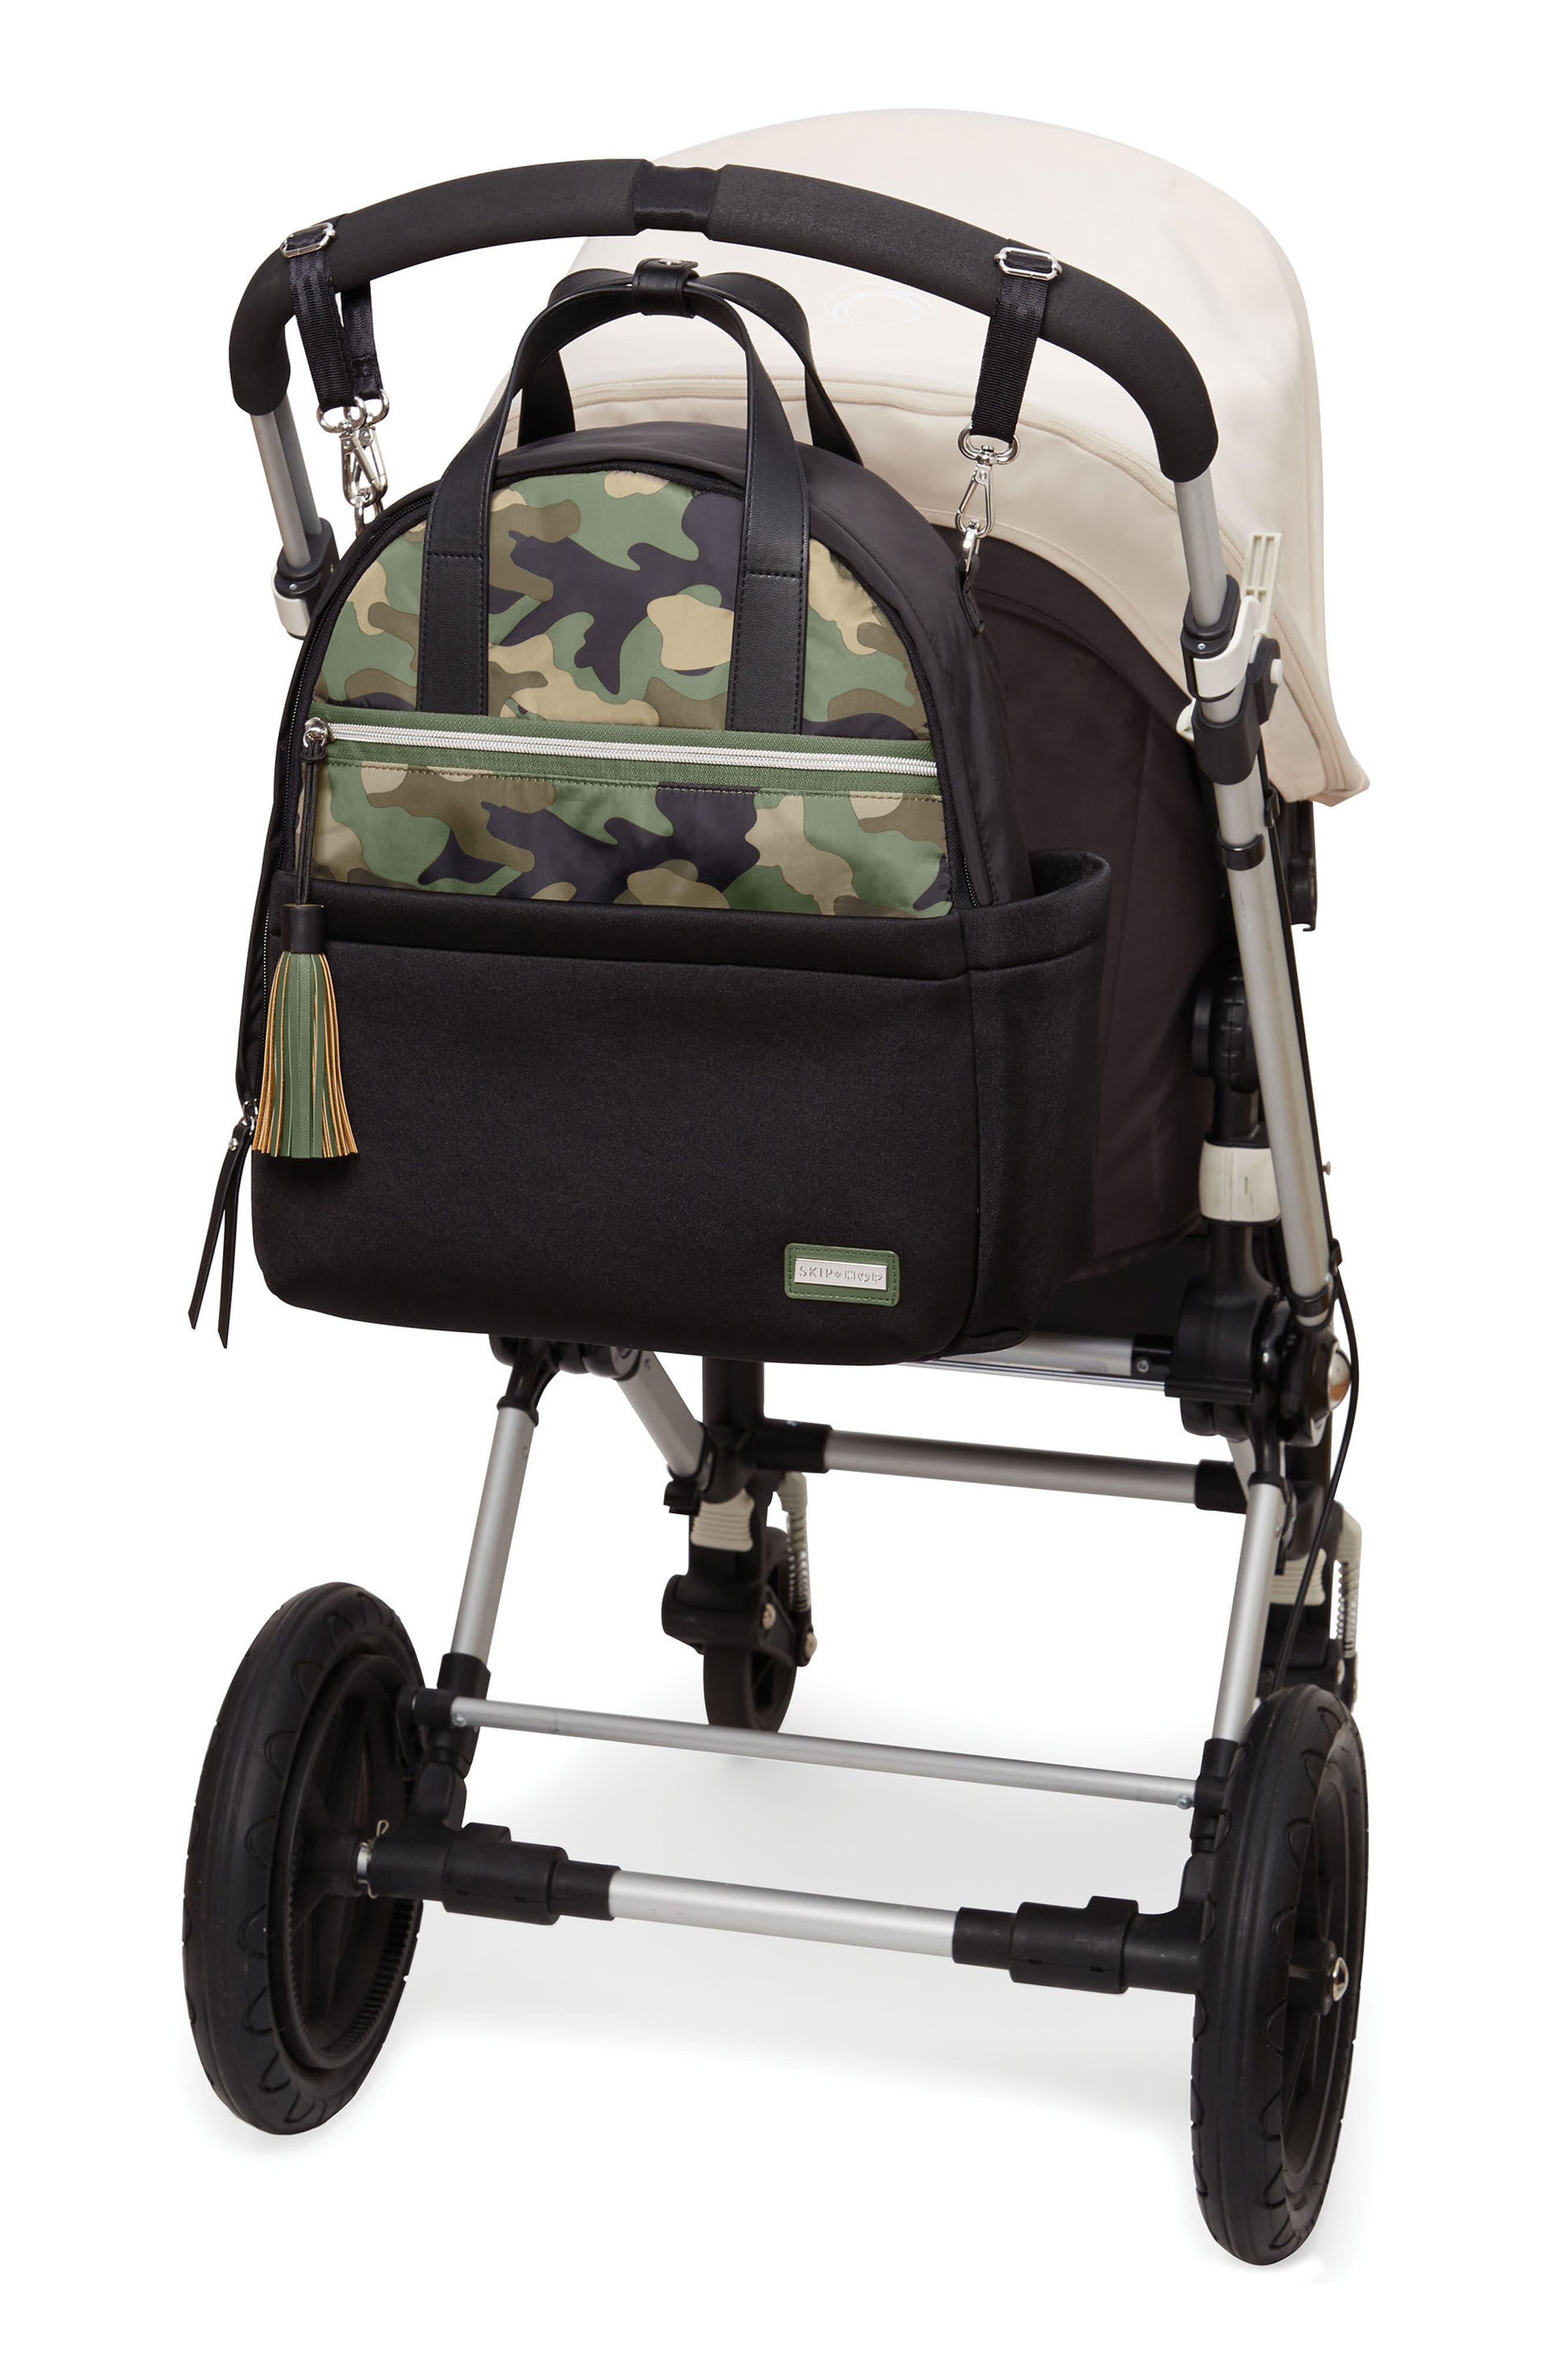 Nolita Neoprene Diaper Backpack,                             Alternate thumbnail 5, color,                             BLACK/ DARK CAMO